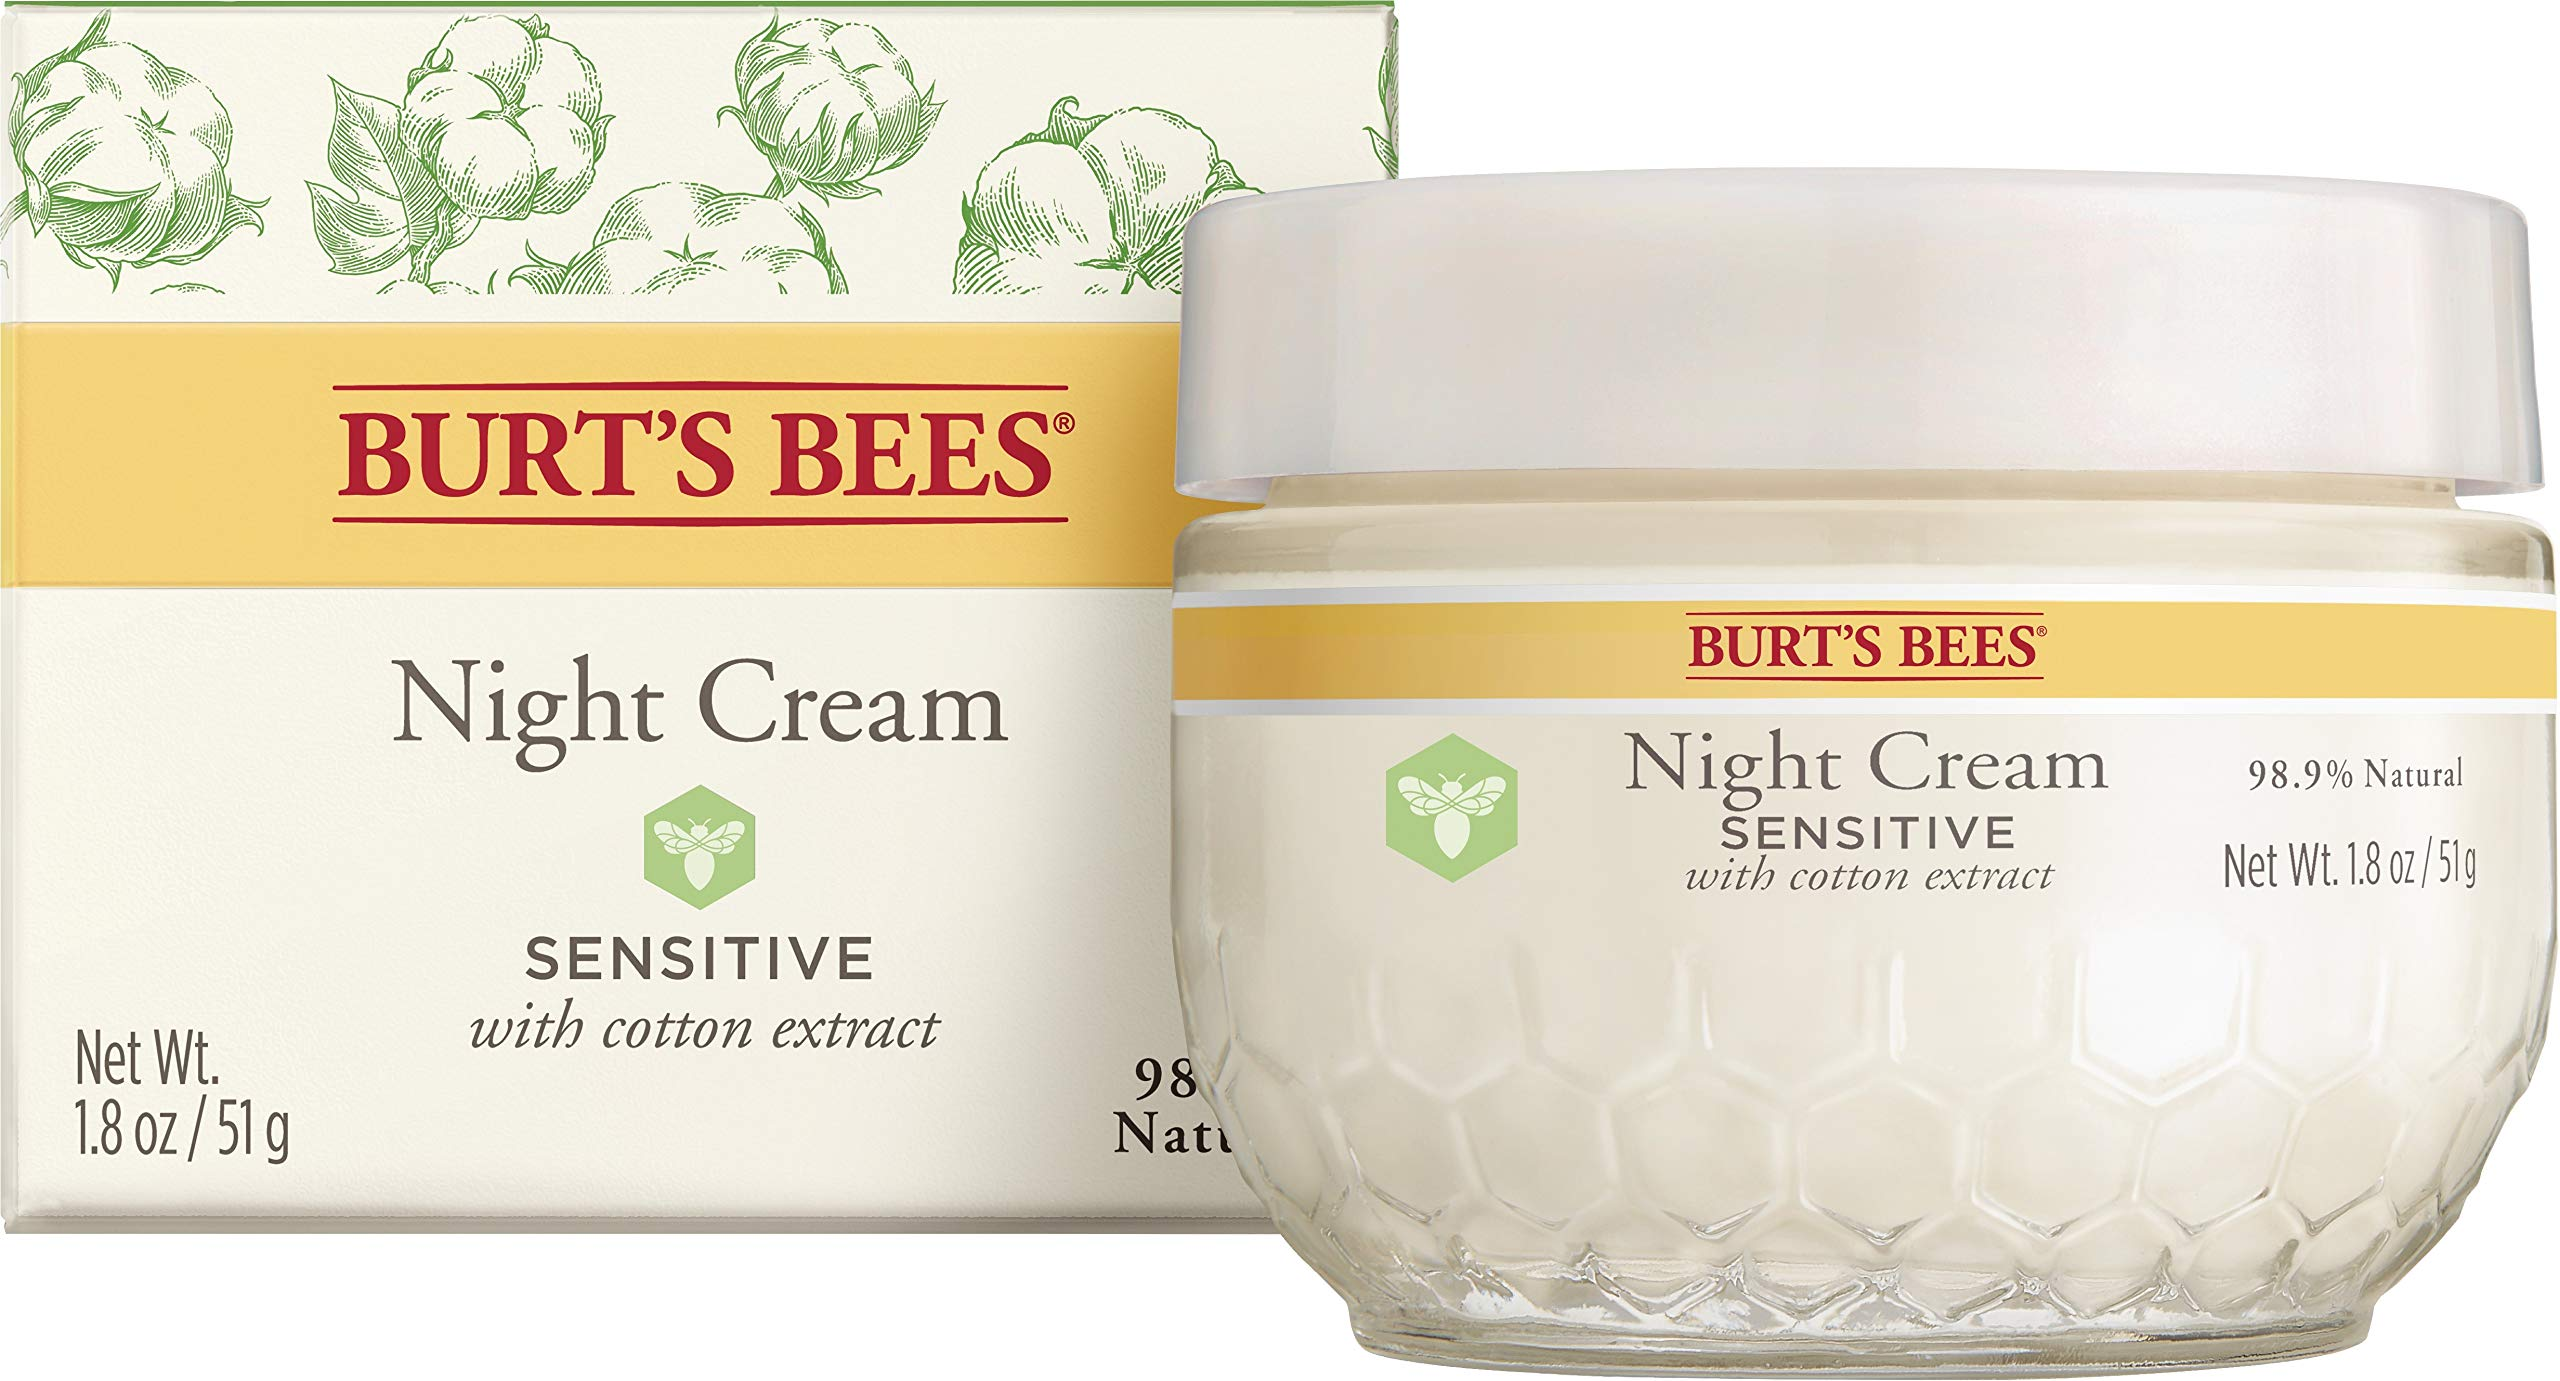 Burt's Bees Night Cream for Sensitive Skin, 1.8 Ounces by Burt's Bees